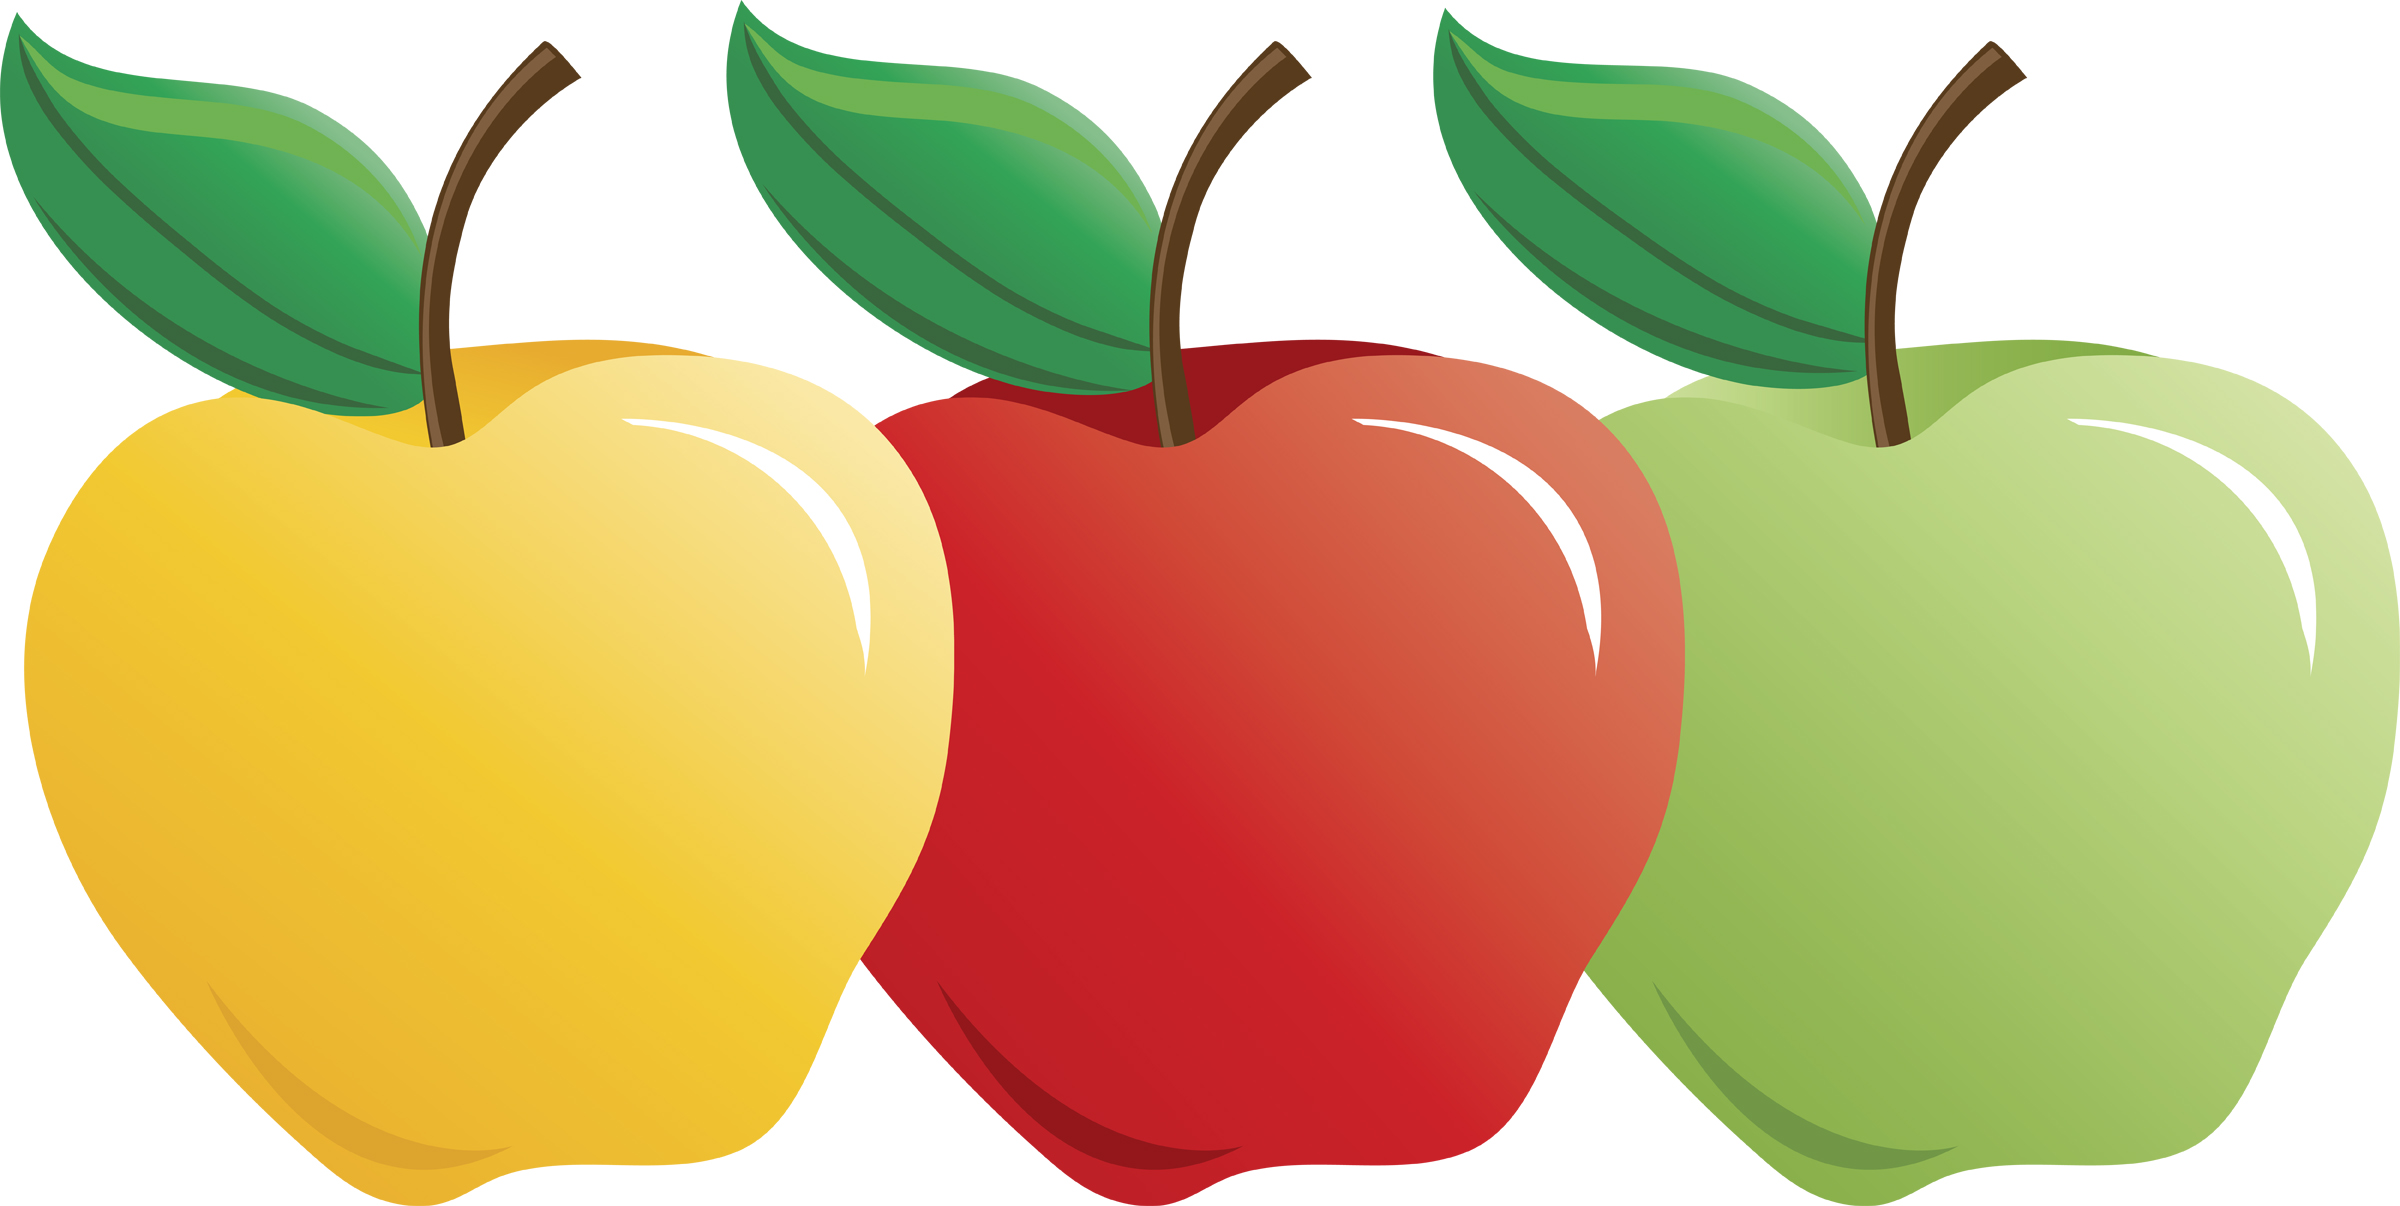 2400x1206 Apple Clip Art 7 2